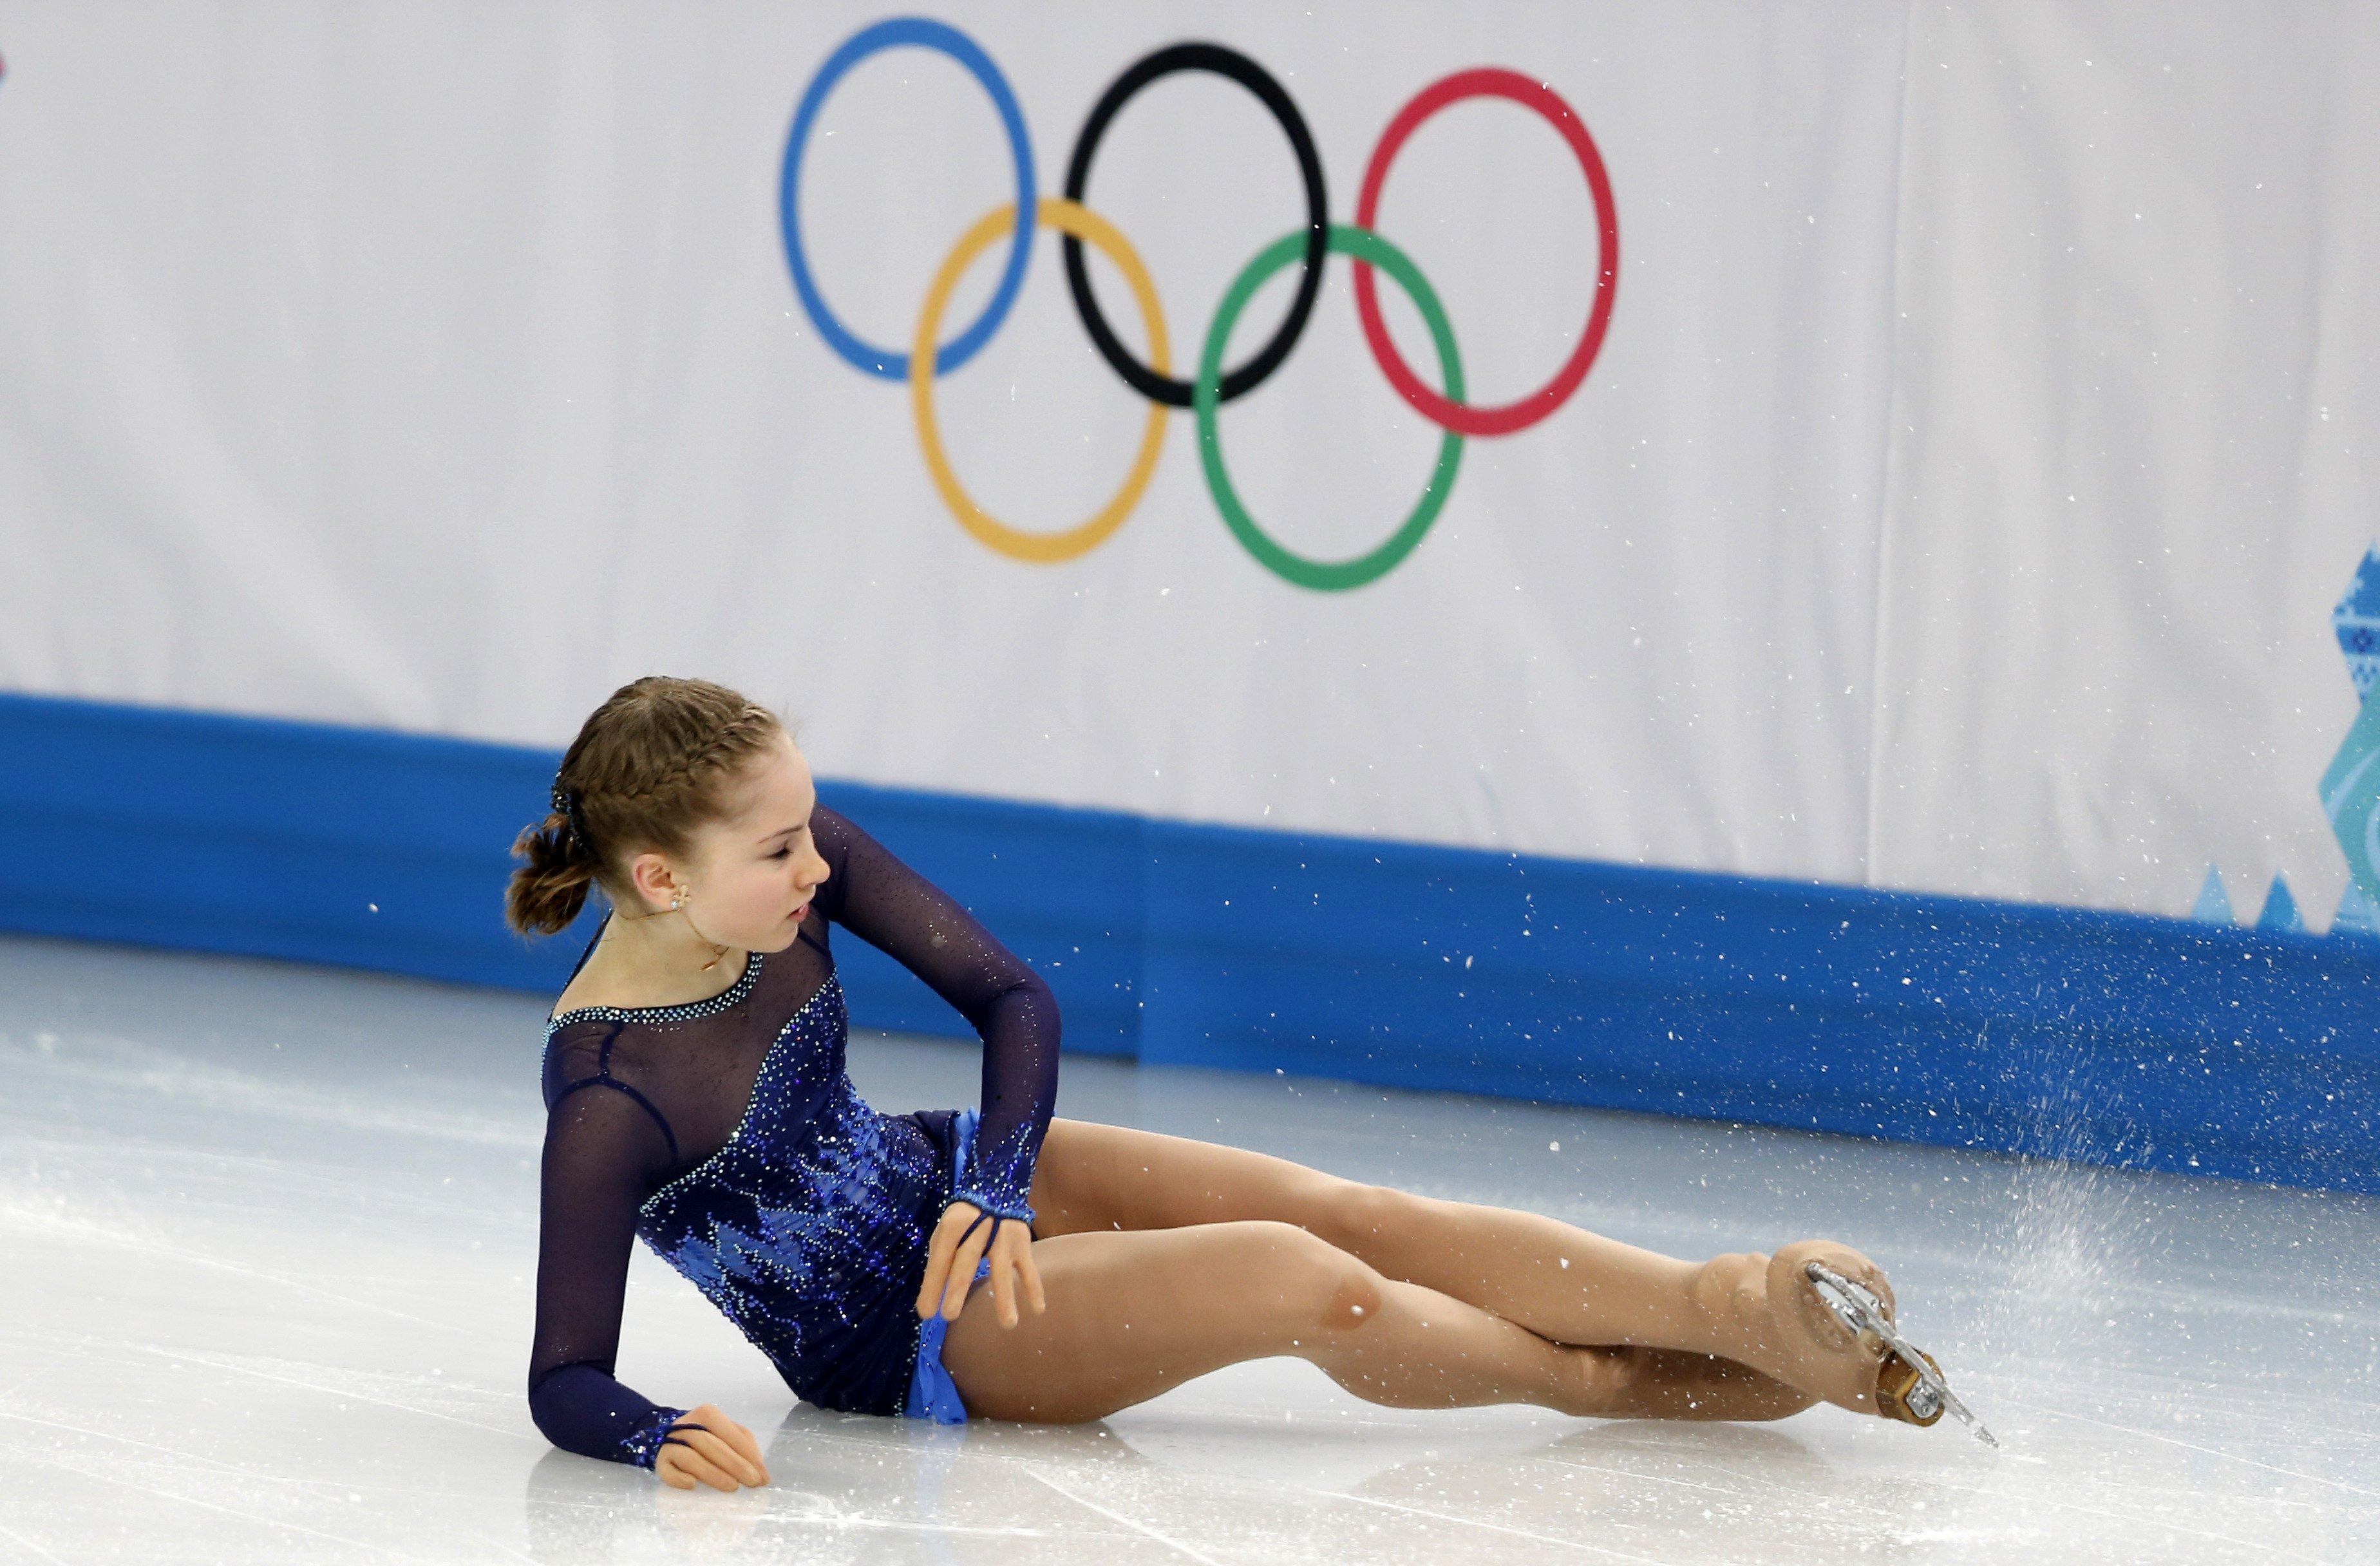 Russia's Yulia Lipnitskaya loses her balance during the ladies short program of Figure Skating at the 2014 Sochi Winter Olympic Games, on Feb. 19, 2014.